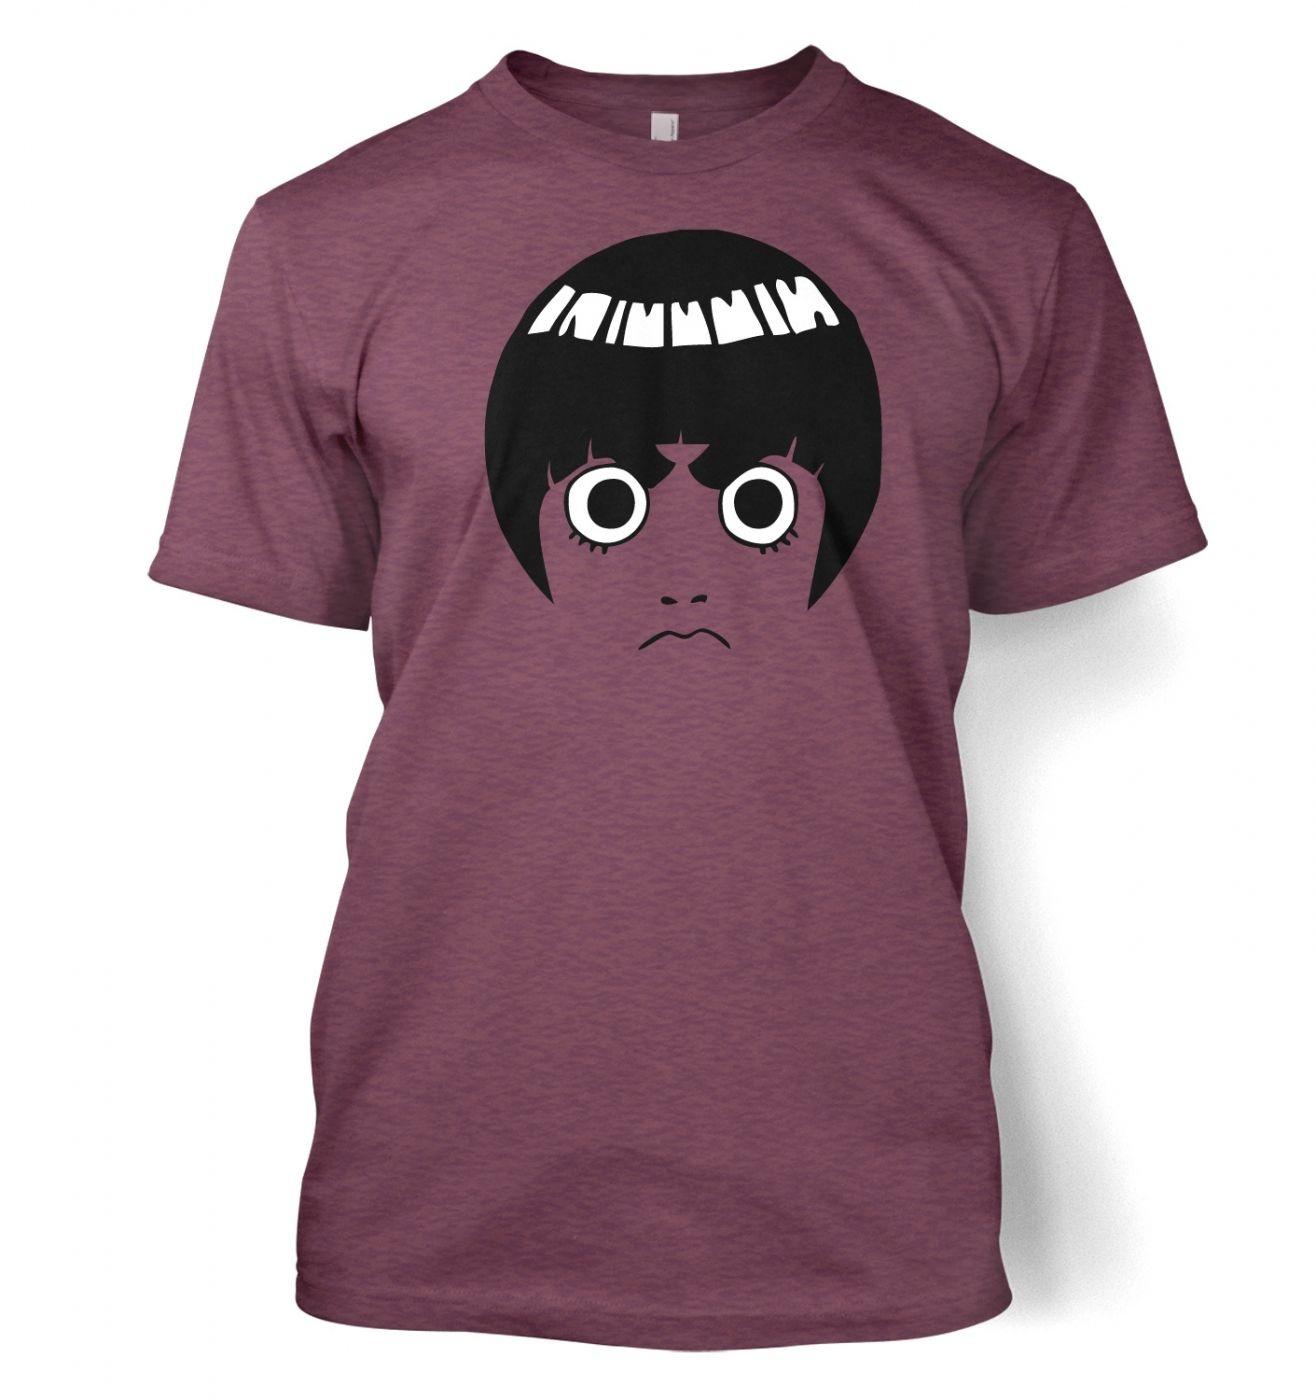 Rock Lee Face - T-Shirt